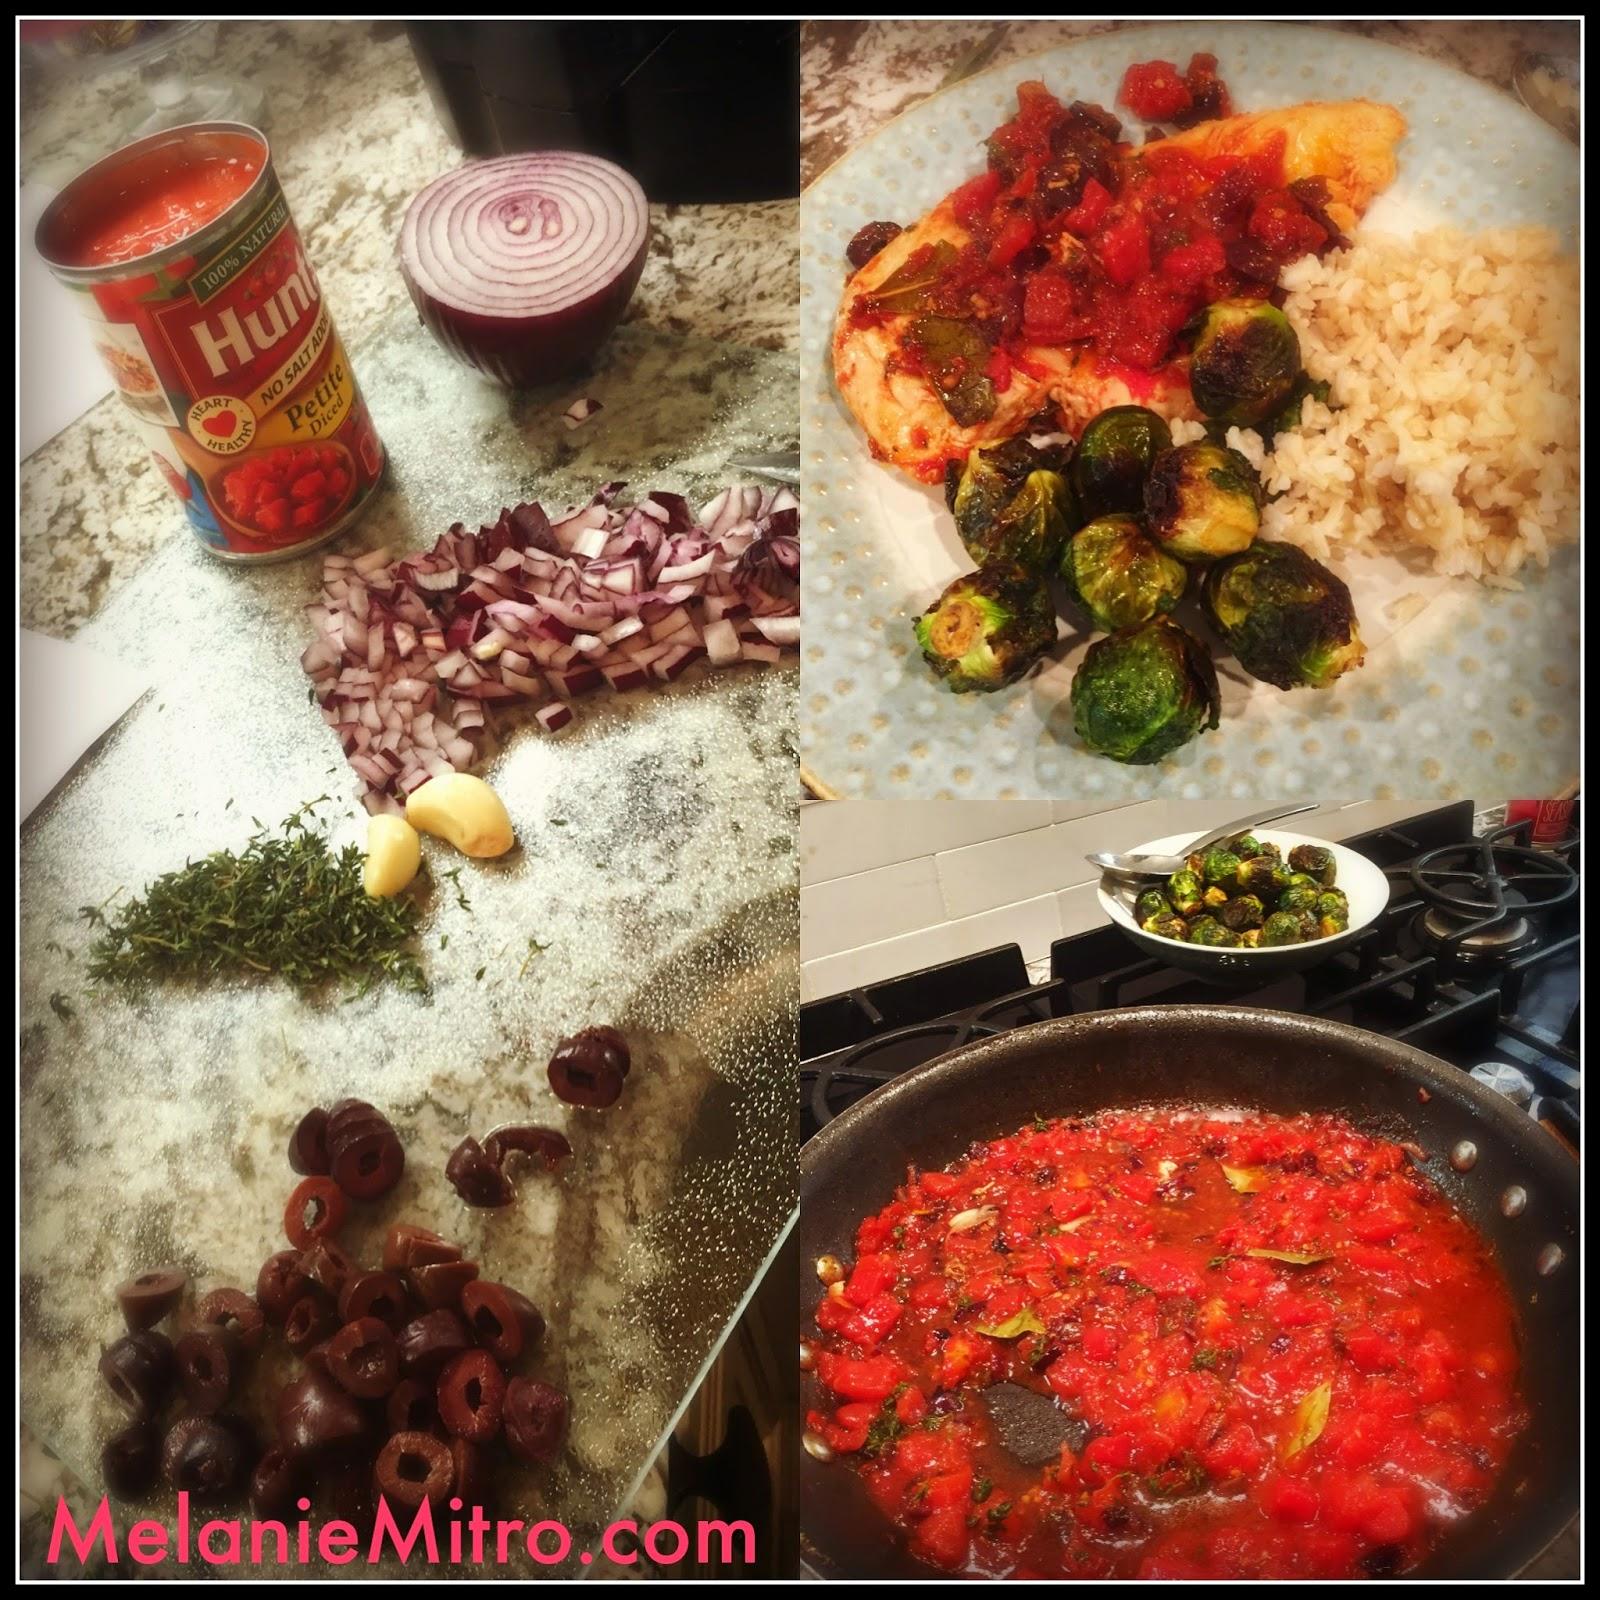 21 Day Fix Dinner Recipe, Melanie Mitro, Clean Eating Dinner Recipe